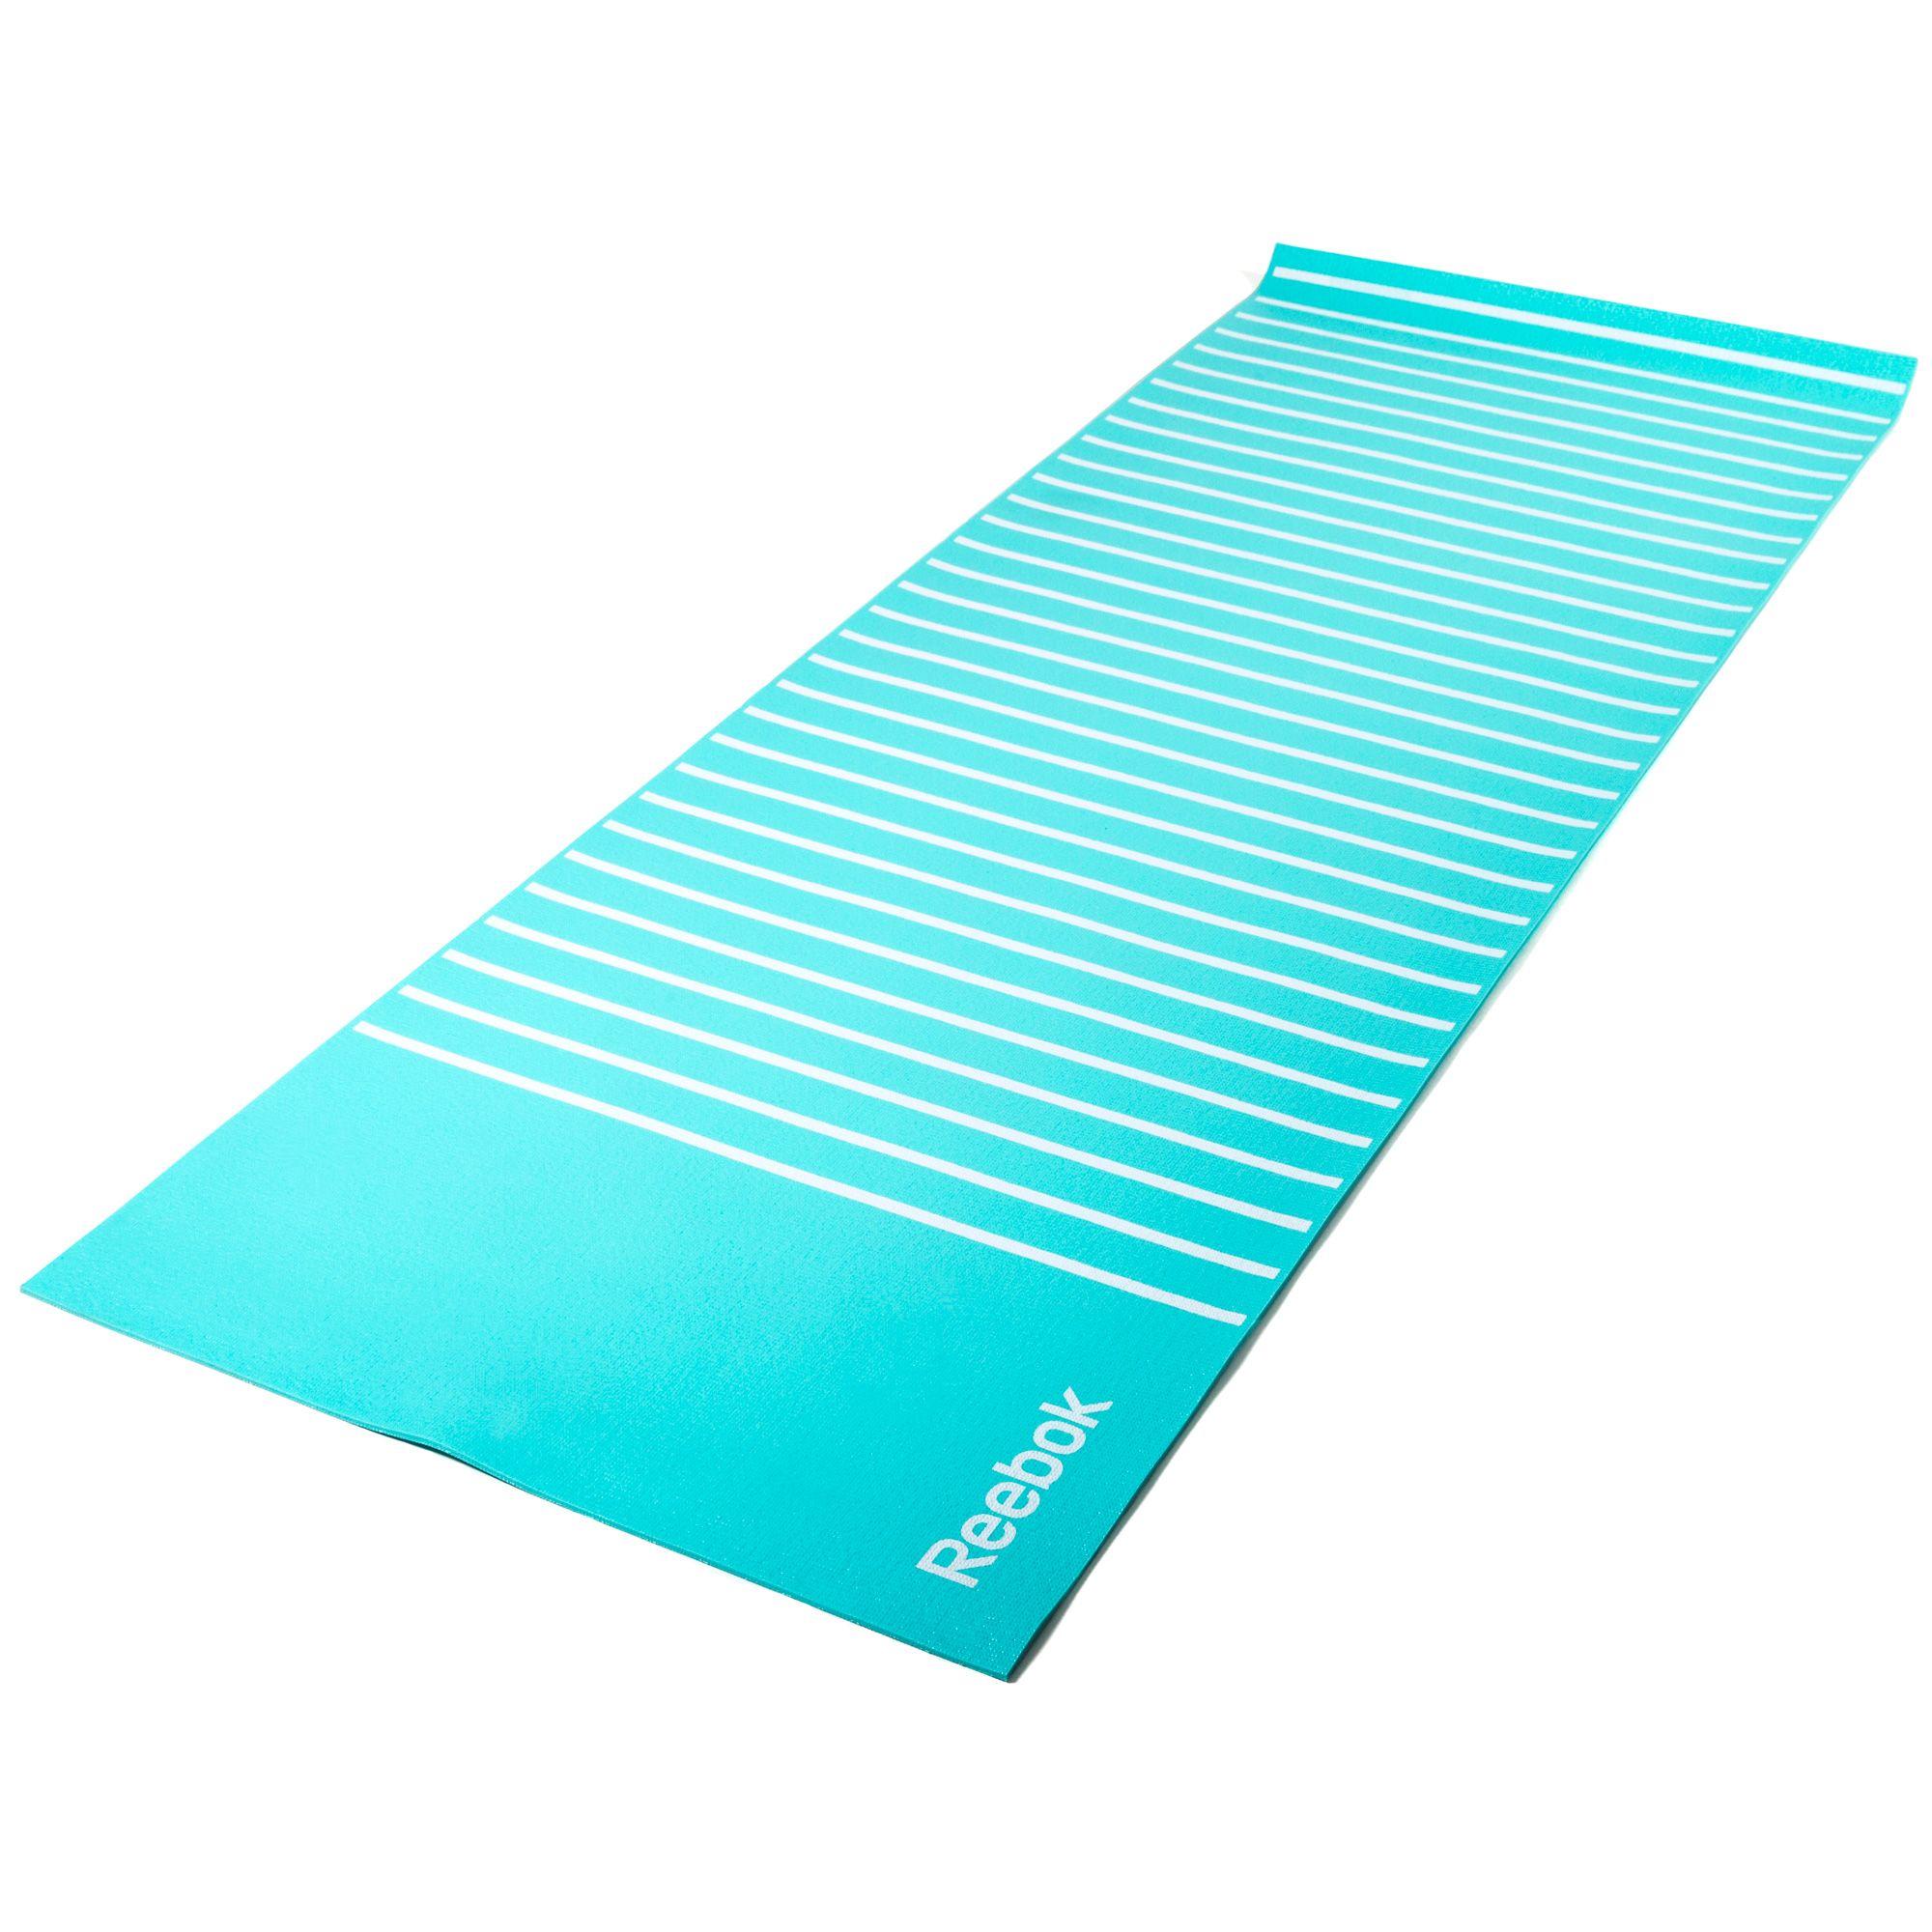 Reebok Crystal Blue 4mm Double Sided Yoga Mat